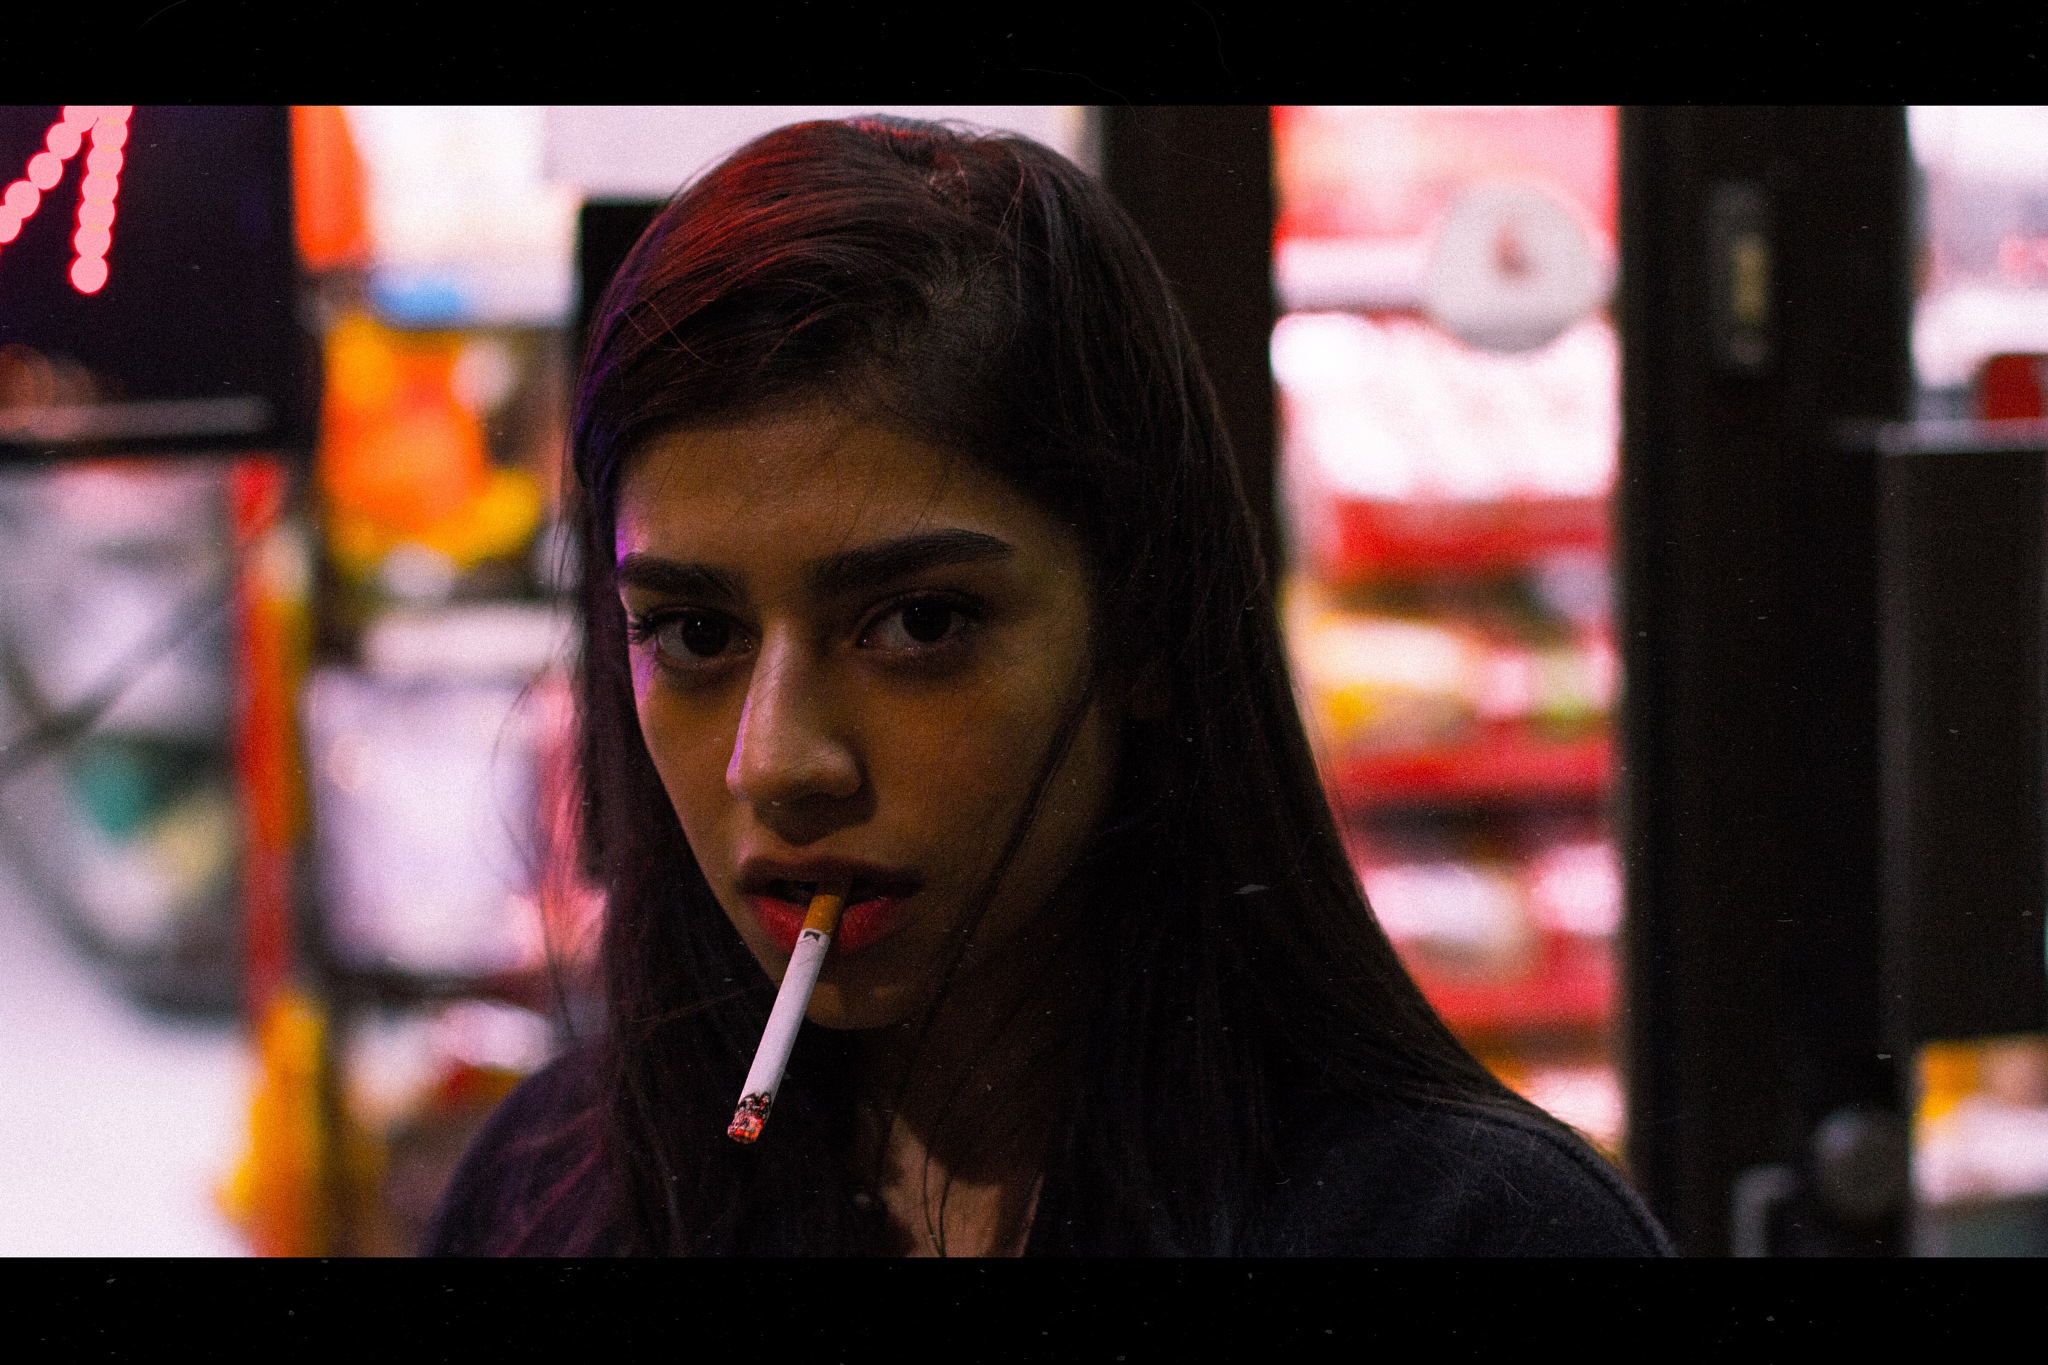 Smoking Kills 2/3 by SuckAttackMedia